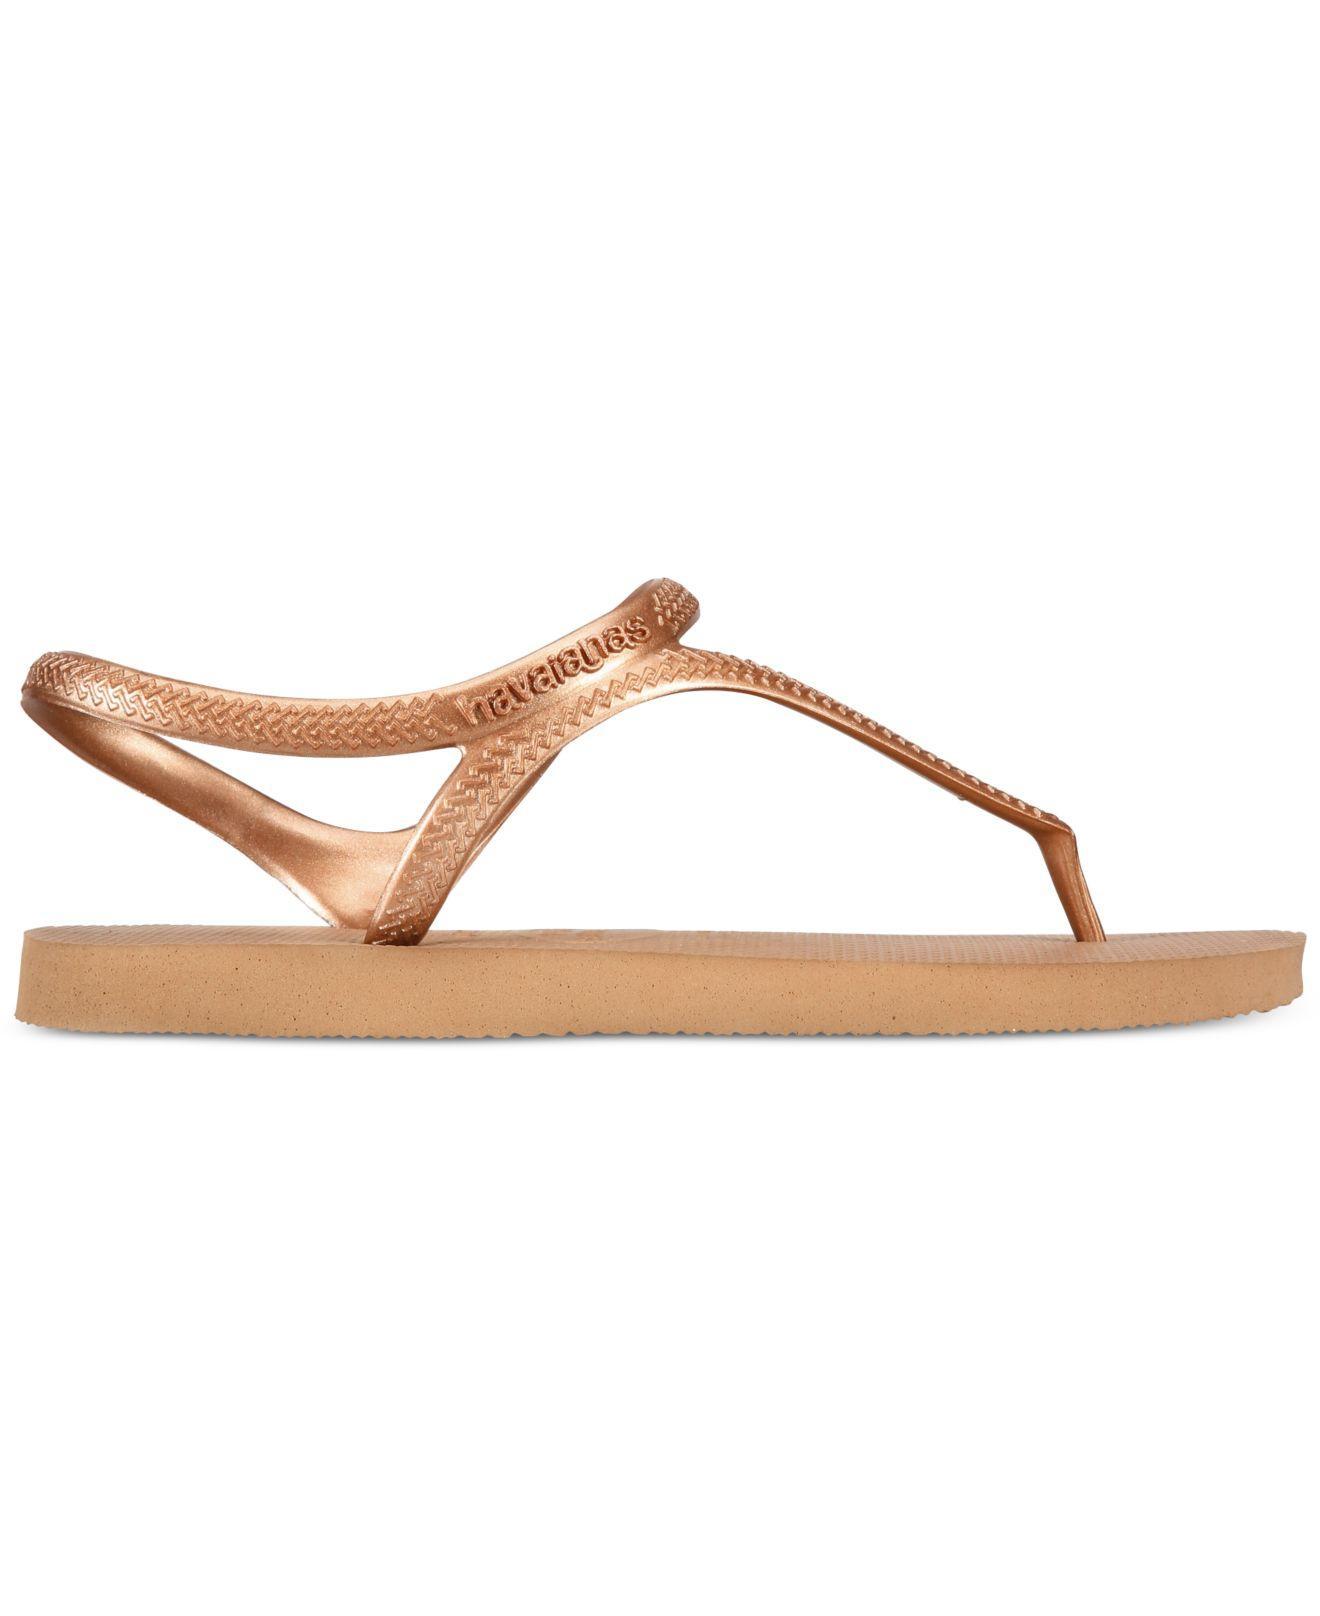 0fe5d533ed39 Lyst - Havaianas Flash Urban Flip-flop Sandals